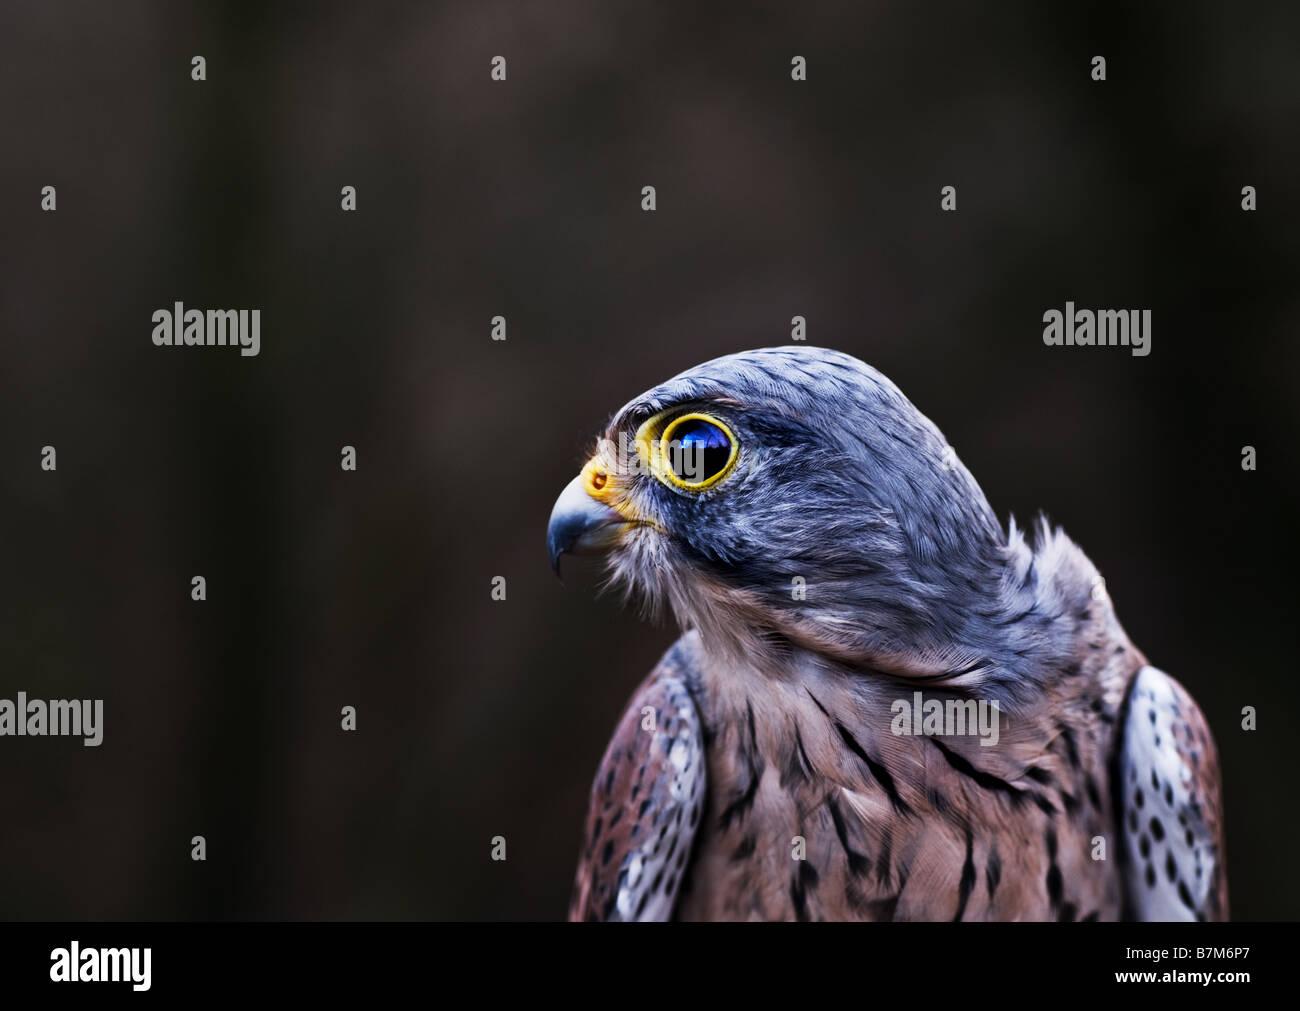 The profile of a male Kestrel. - Stock Image